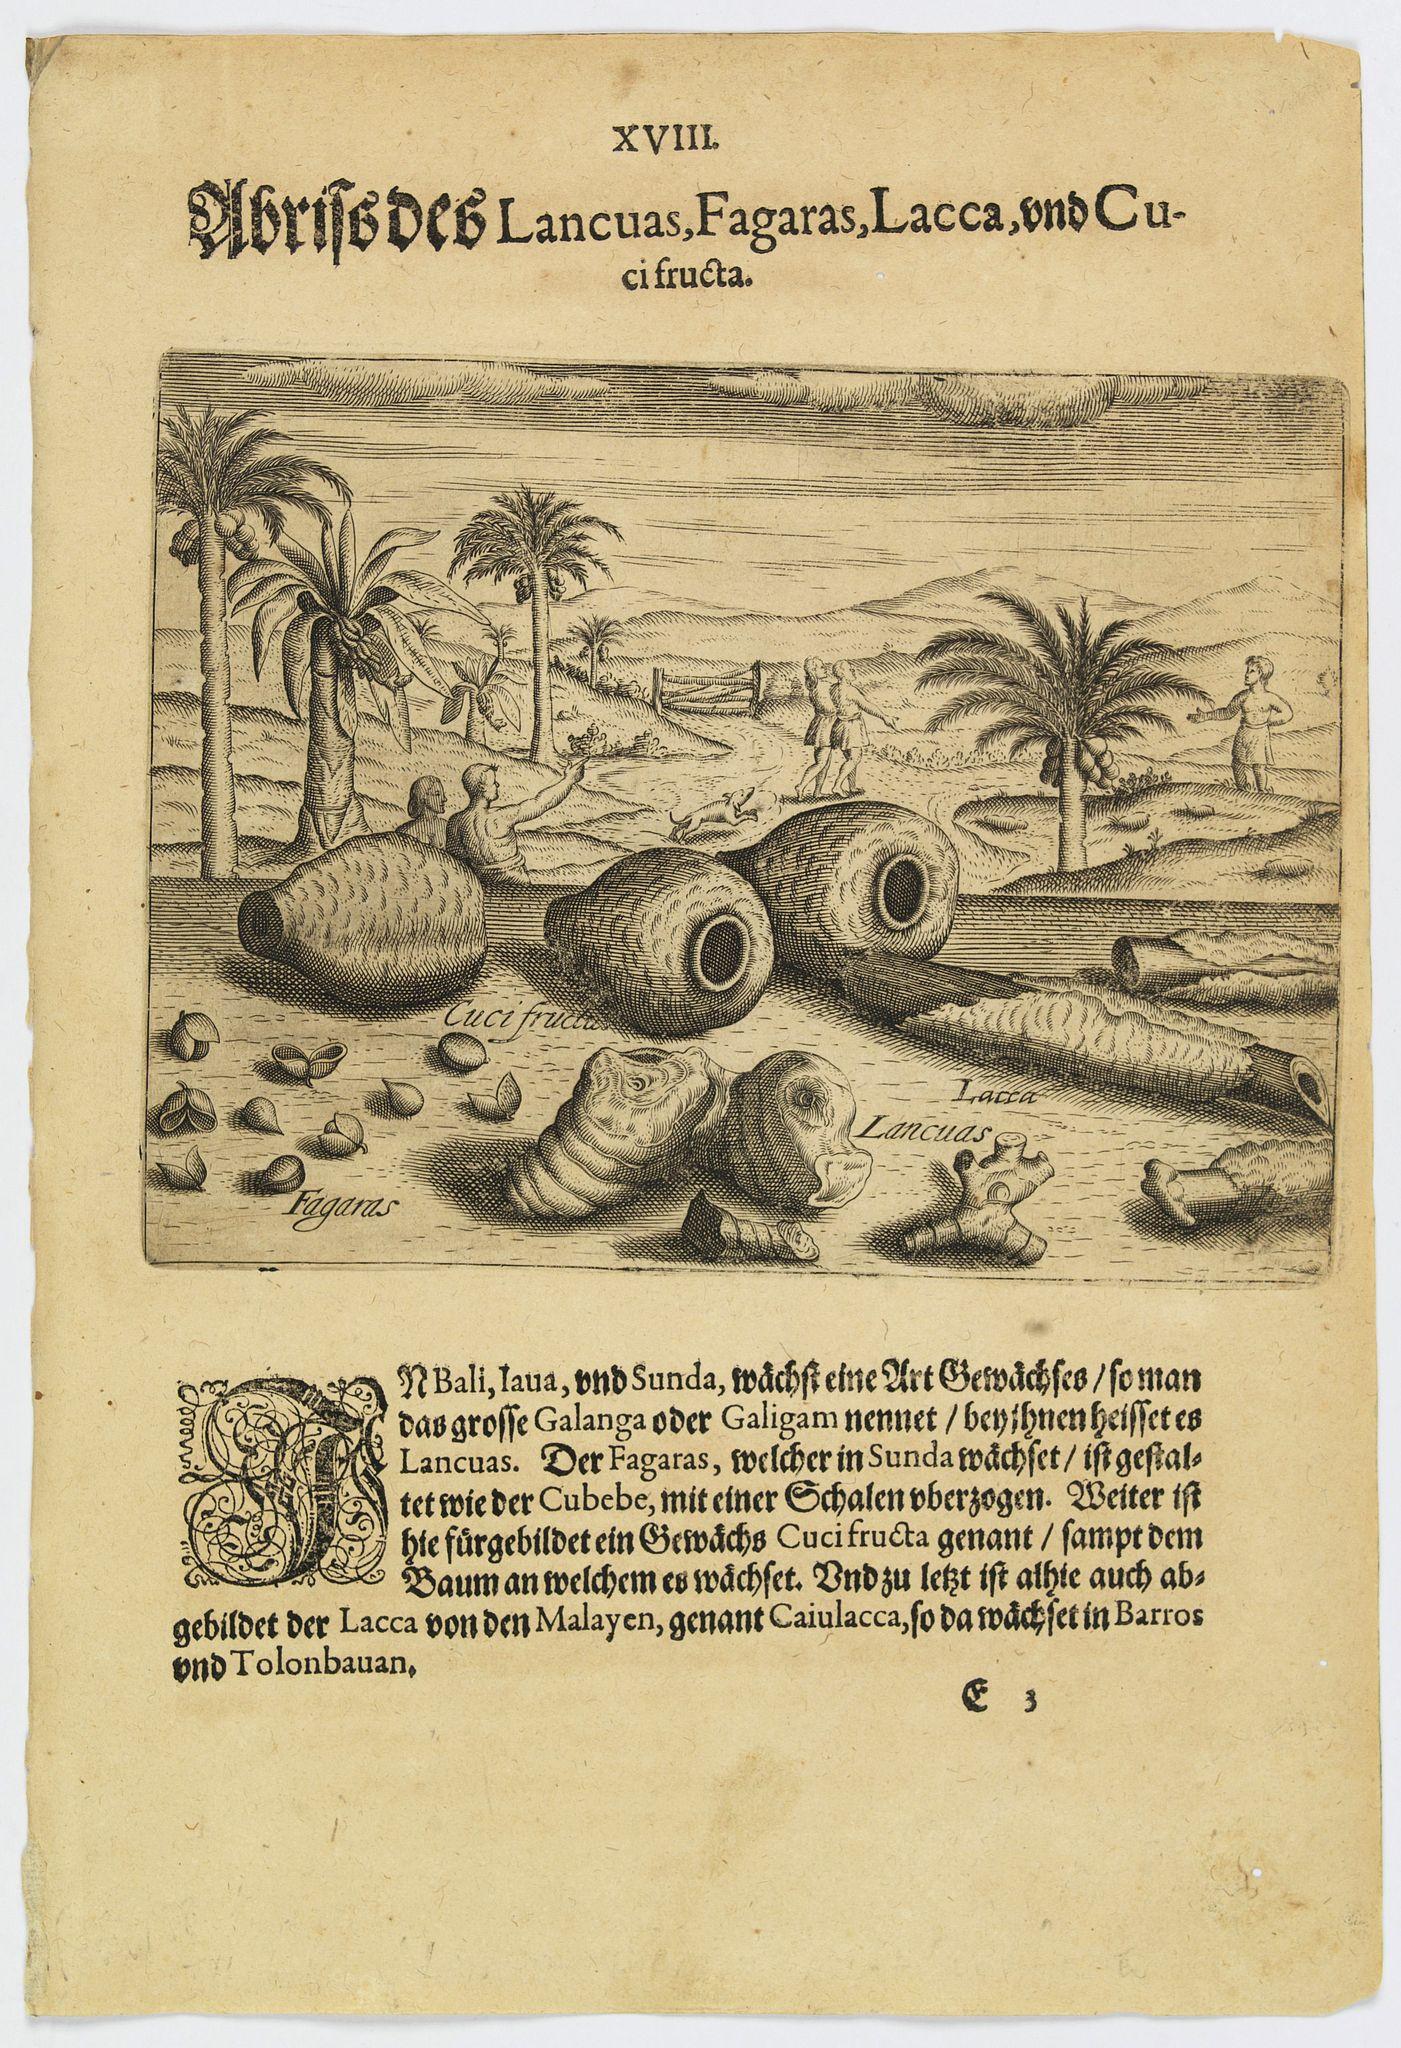 DE BRY, Th. -  Illustrations of Lancuas, Fagaras, Lacca and Cuci fructa.